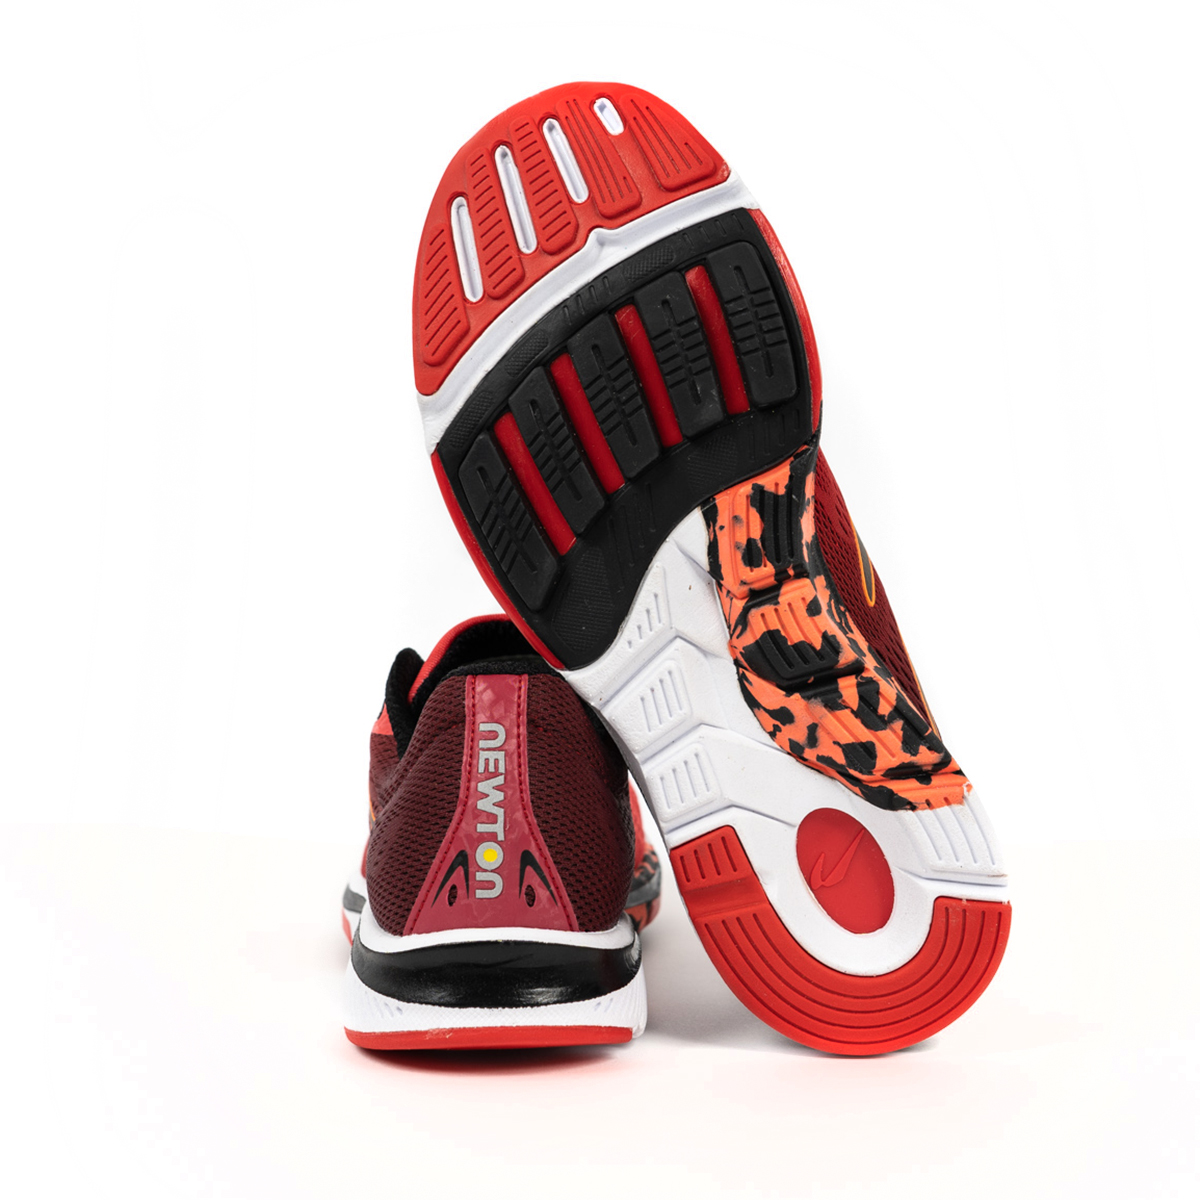 Men's Newton Motion 9 Running Shoe - Color: Brick/Orange (Regular Width) - Size: 6, Brick/Orange, large, image 2